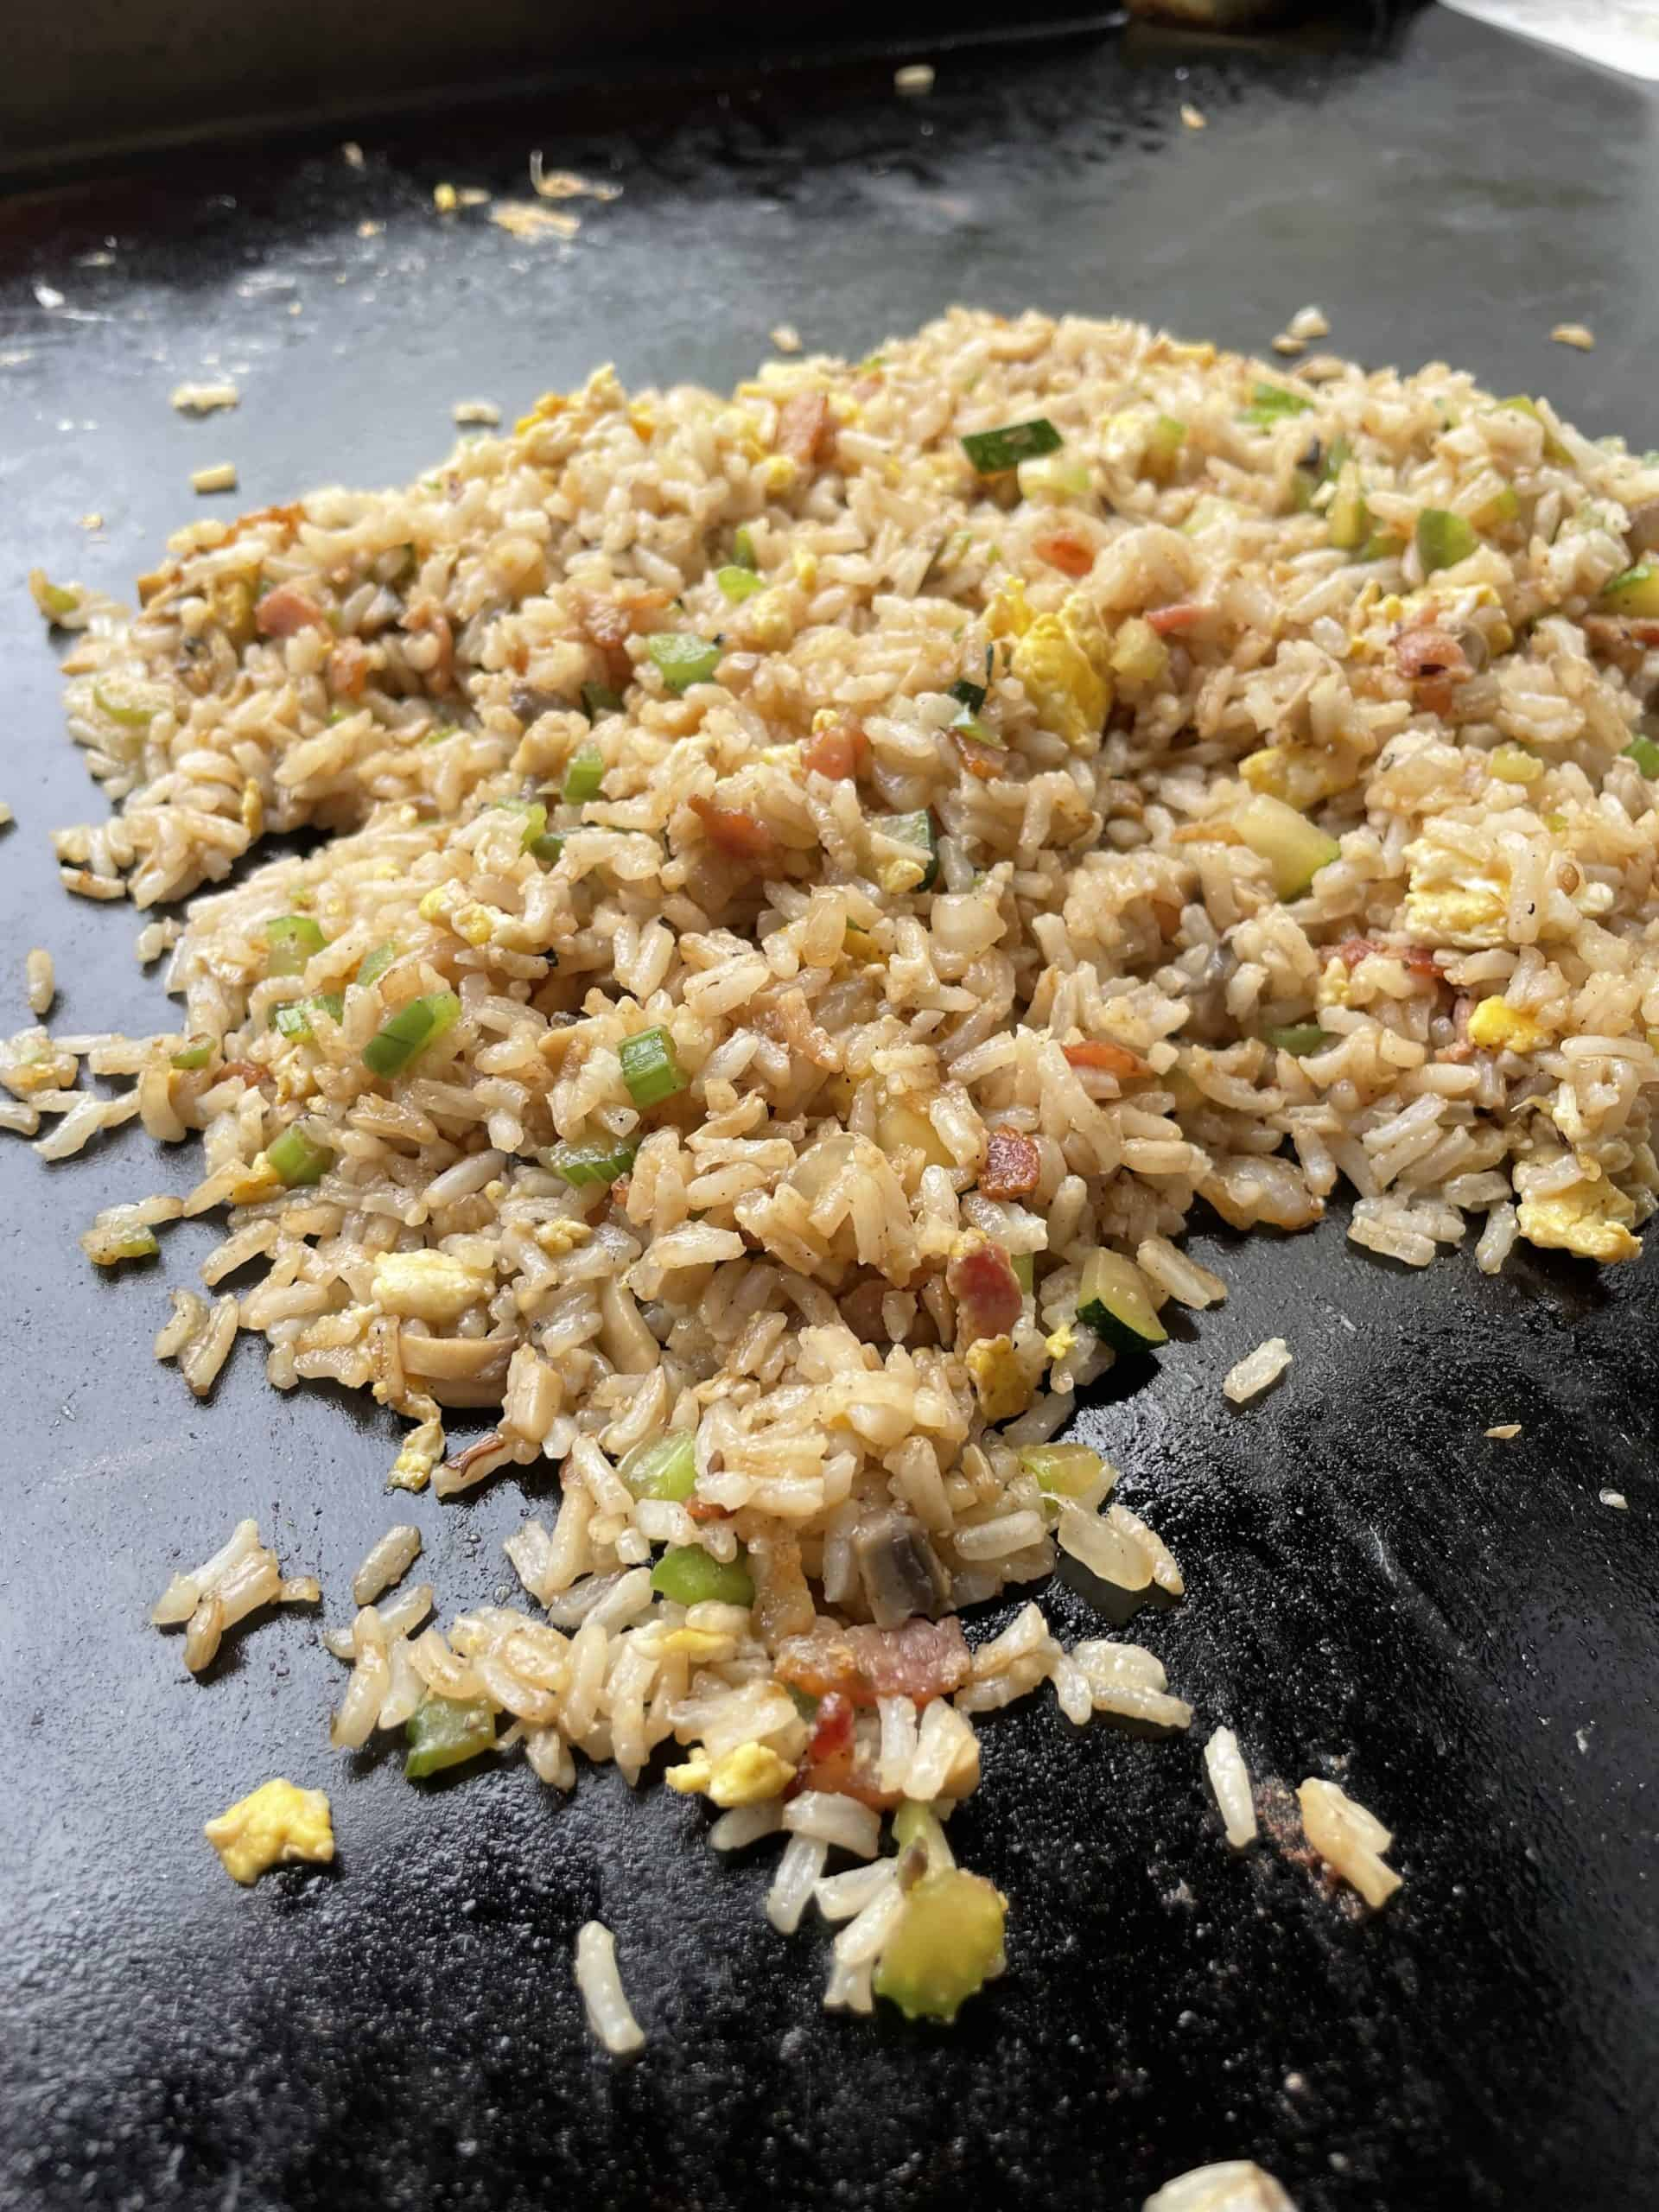 Seasoned Fried Rice on a Blackstone Griddle.